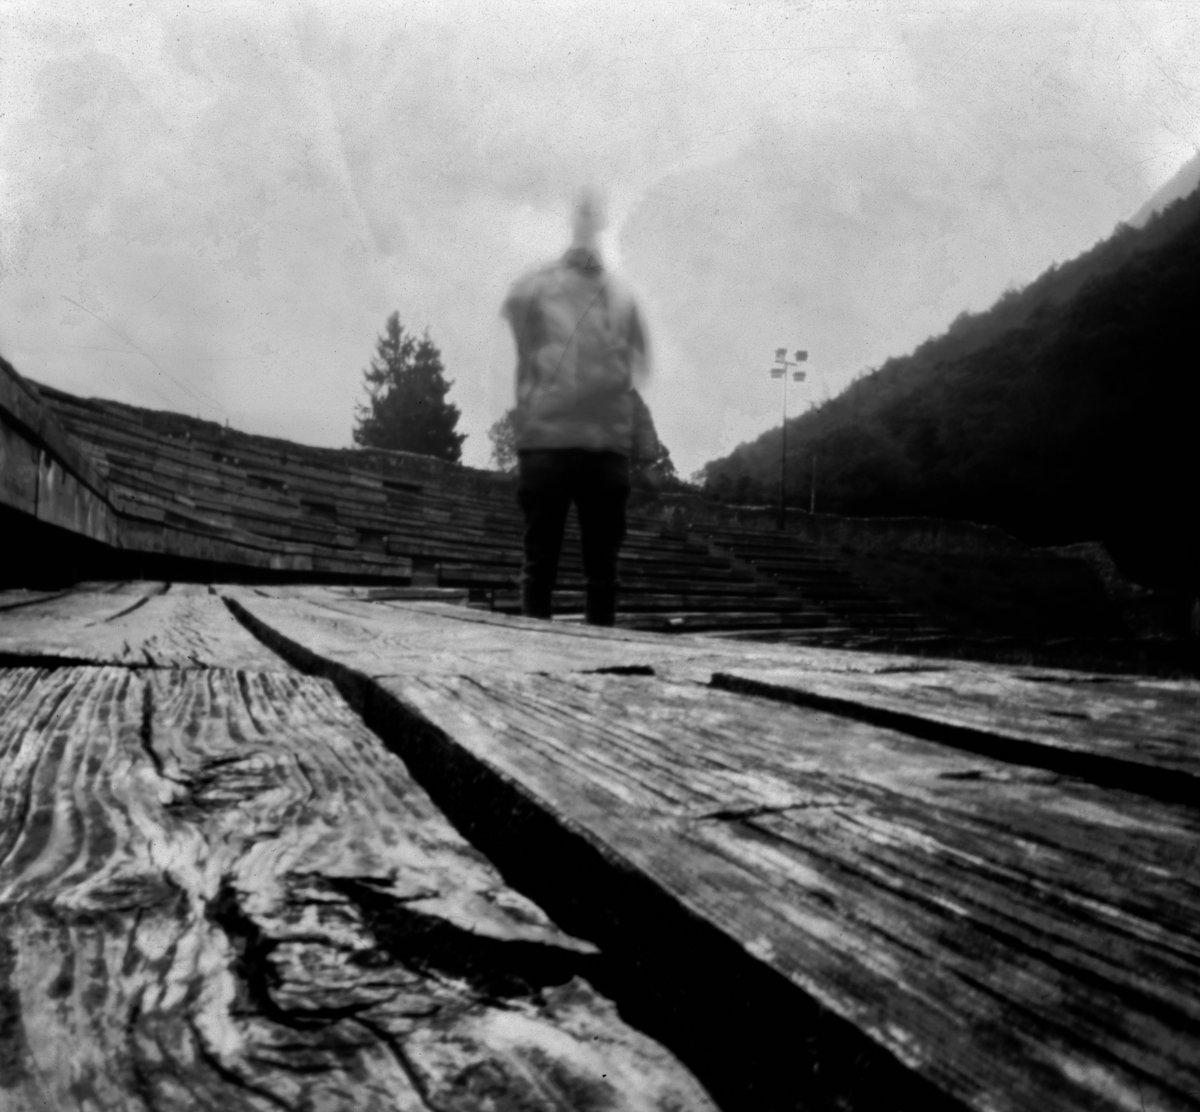 Sheezahee – Noises for the Blind (2018)